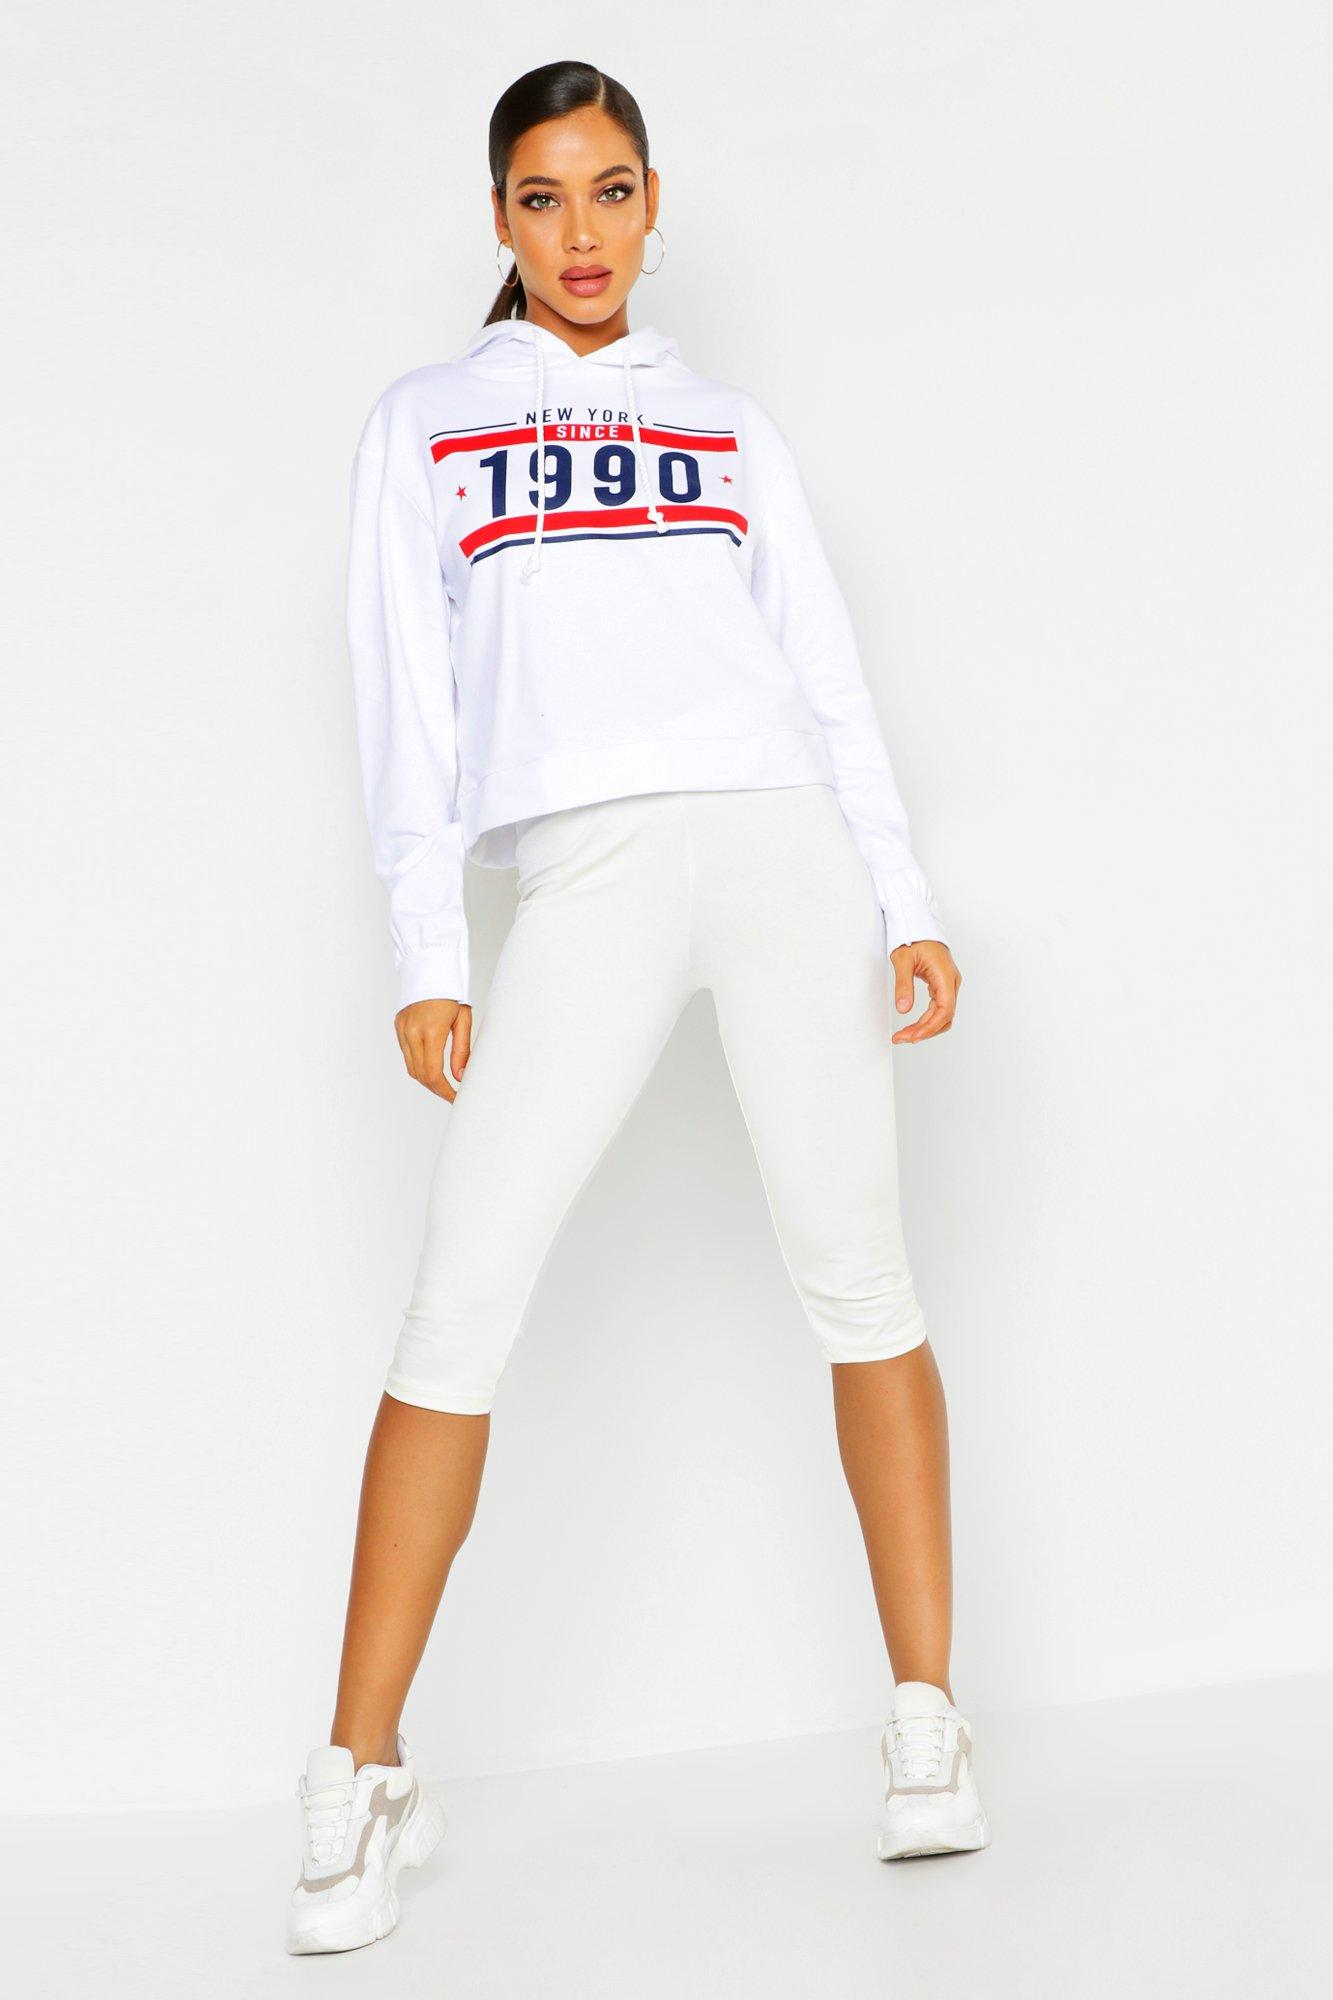 Купить Athleisure, Толстовка оверсайз с капюшоном New York Since 1990, boohoo